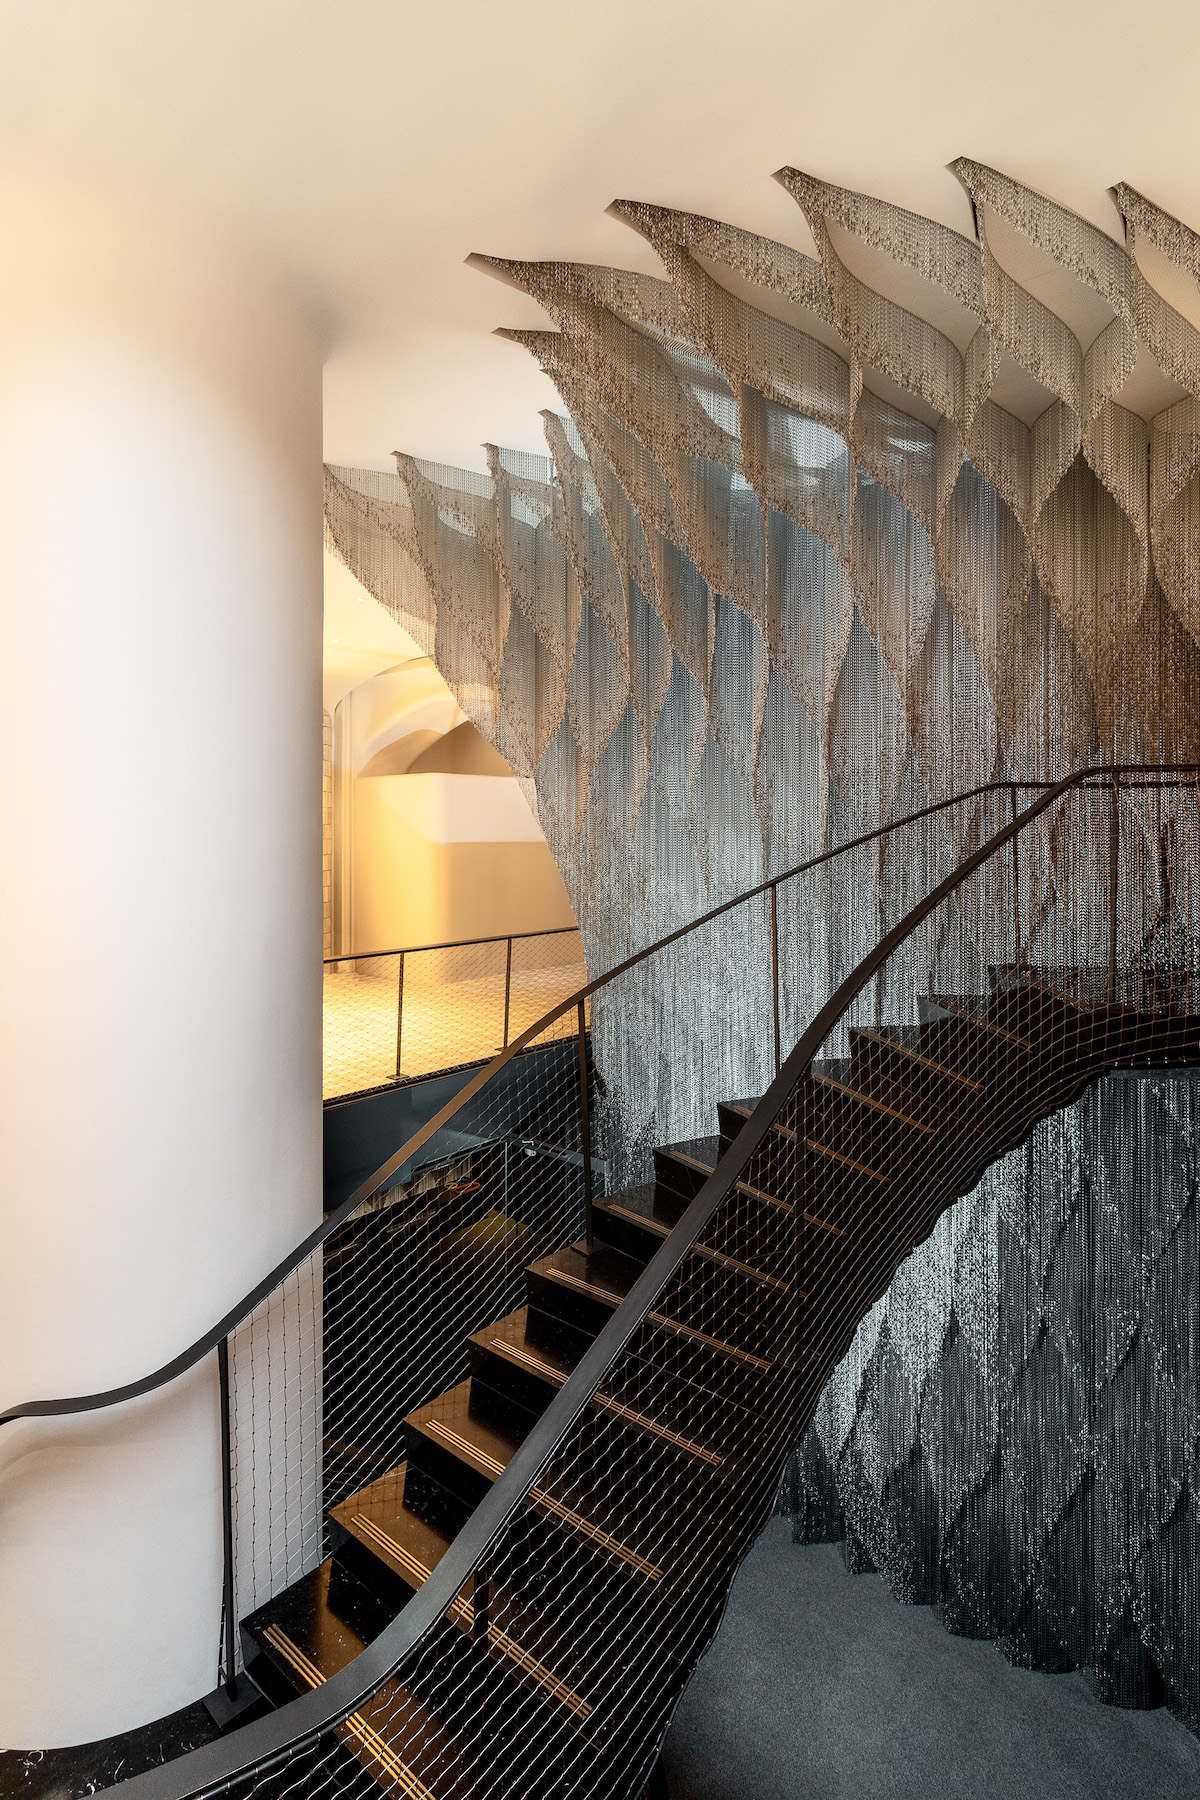 Looking Down At Kengo Kuma Aluminum Chain Staircase in Gaudí's Casa Batlló, Captured by Jordi Anguera